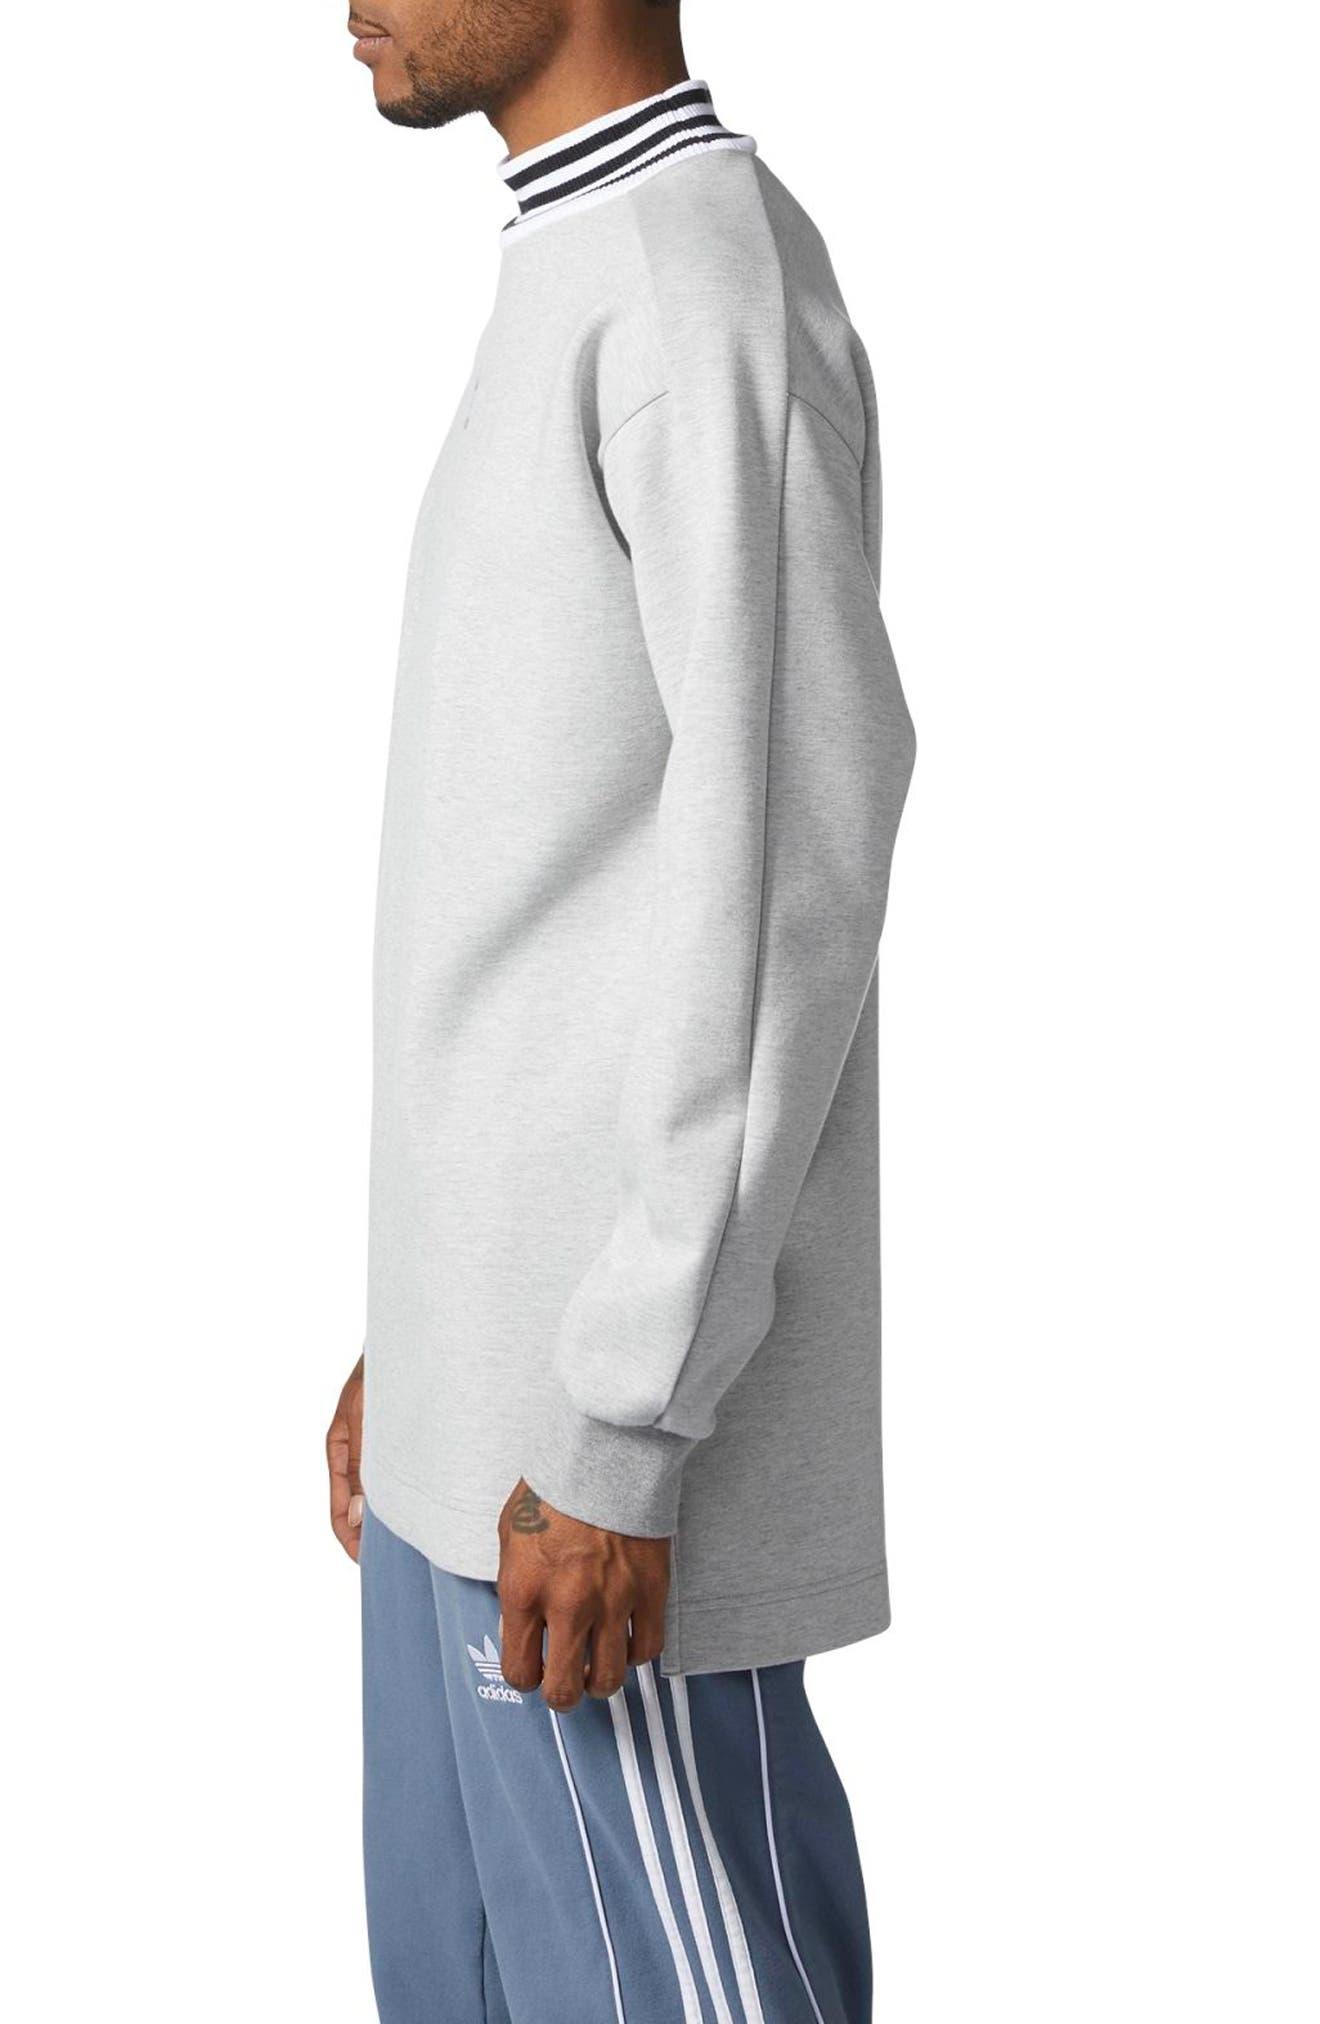 ADIDAS ORIGINALS,                             Mock Neck Sweatshirt,                             Alternate thumbnail 3, color,                             035